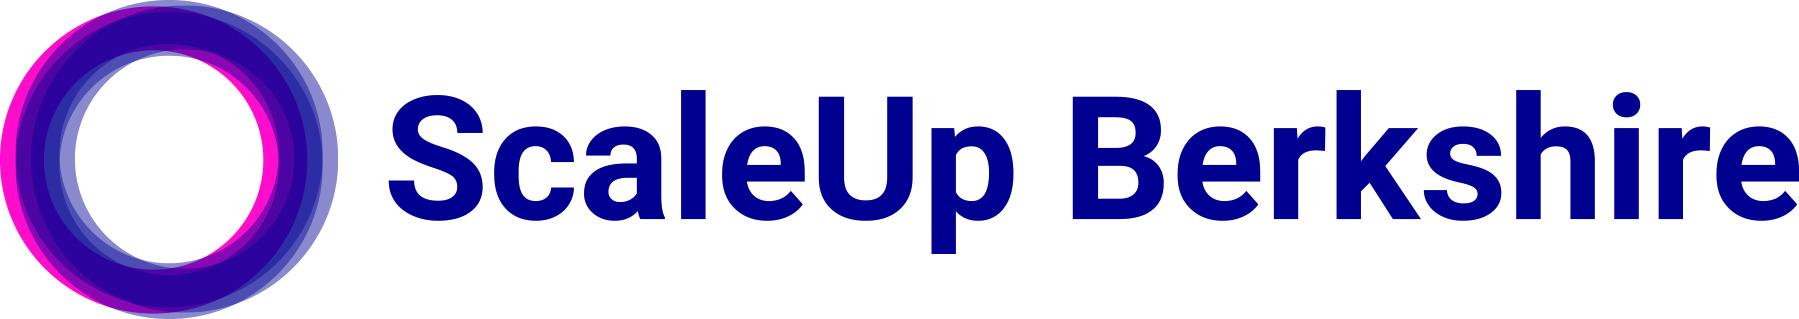 ScaleUp-Berkshire-Logo.jpg?mtime=20190426171455#asset:114756